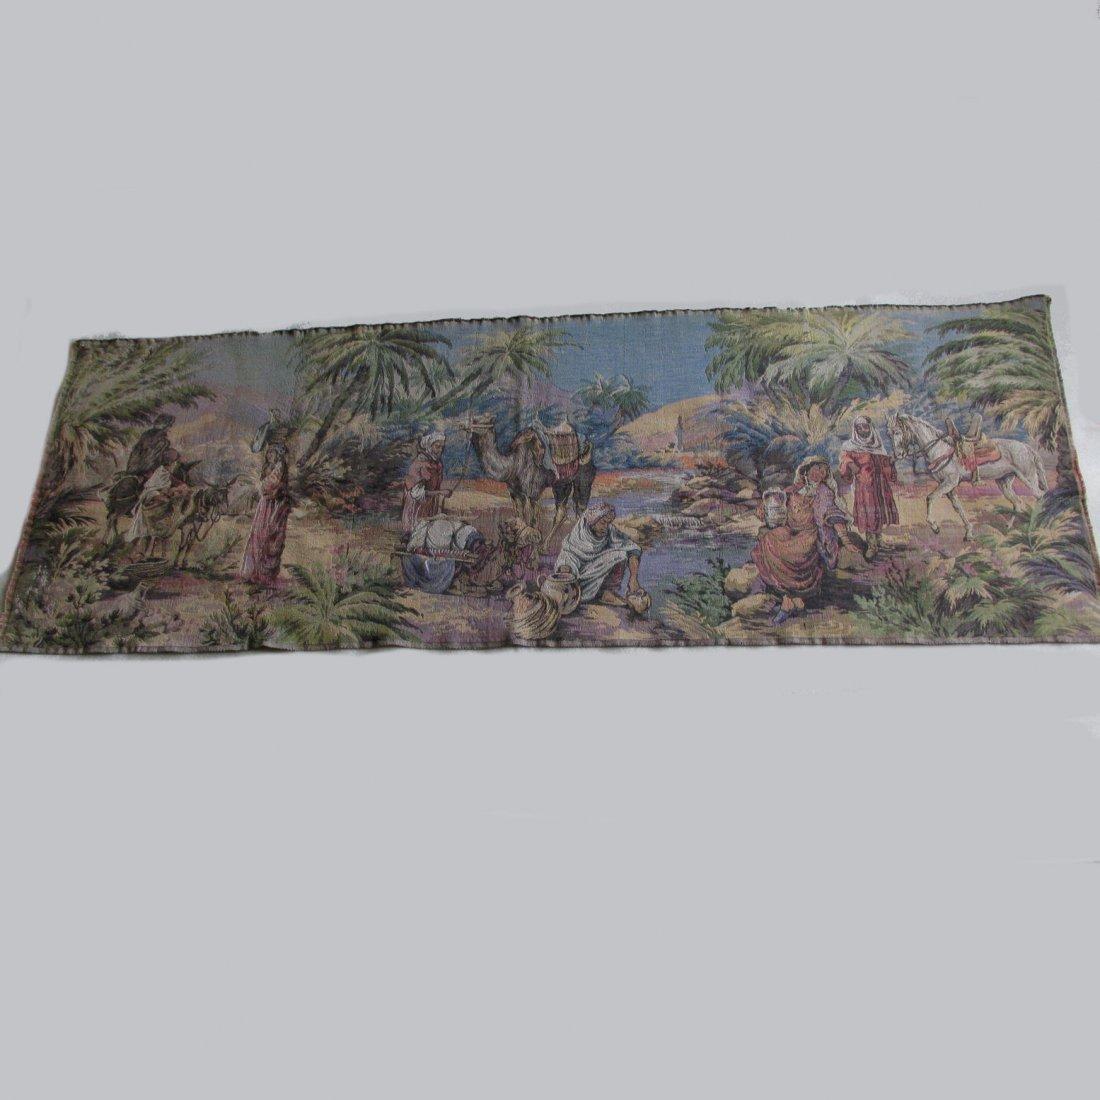 Antique Moorish Arabesque Tapestry Wall Hanging